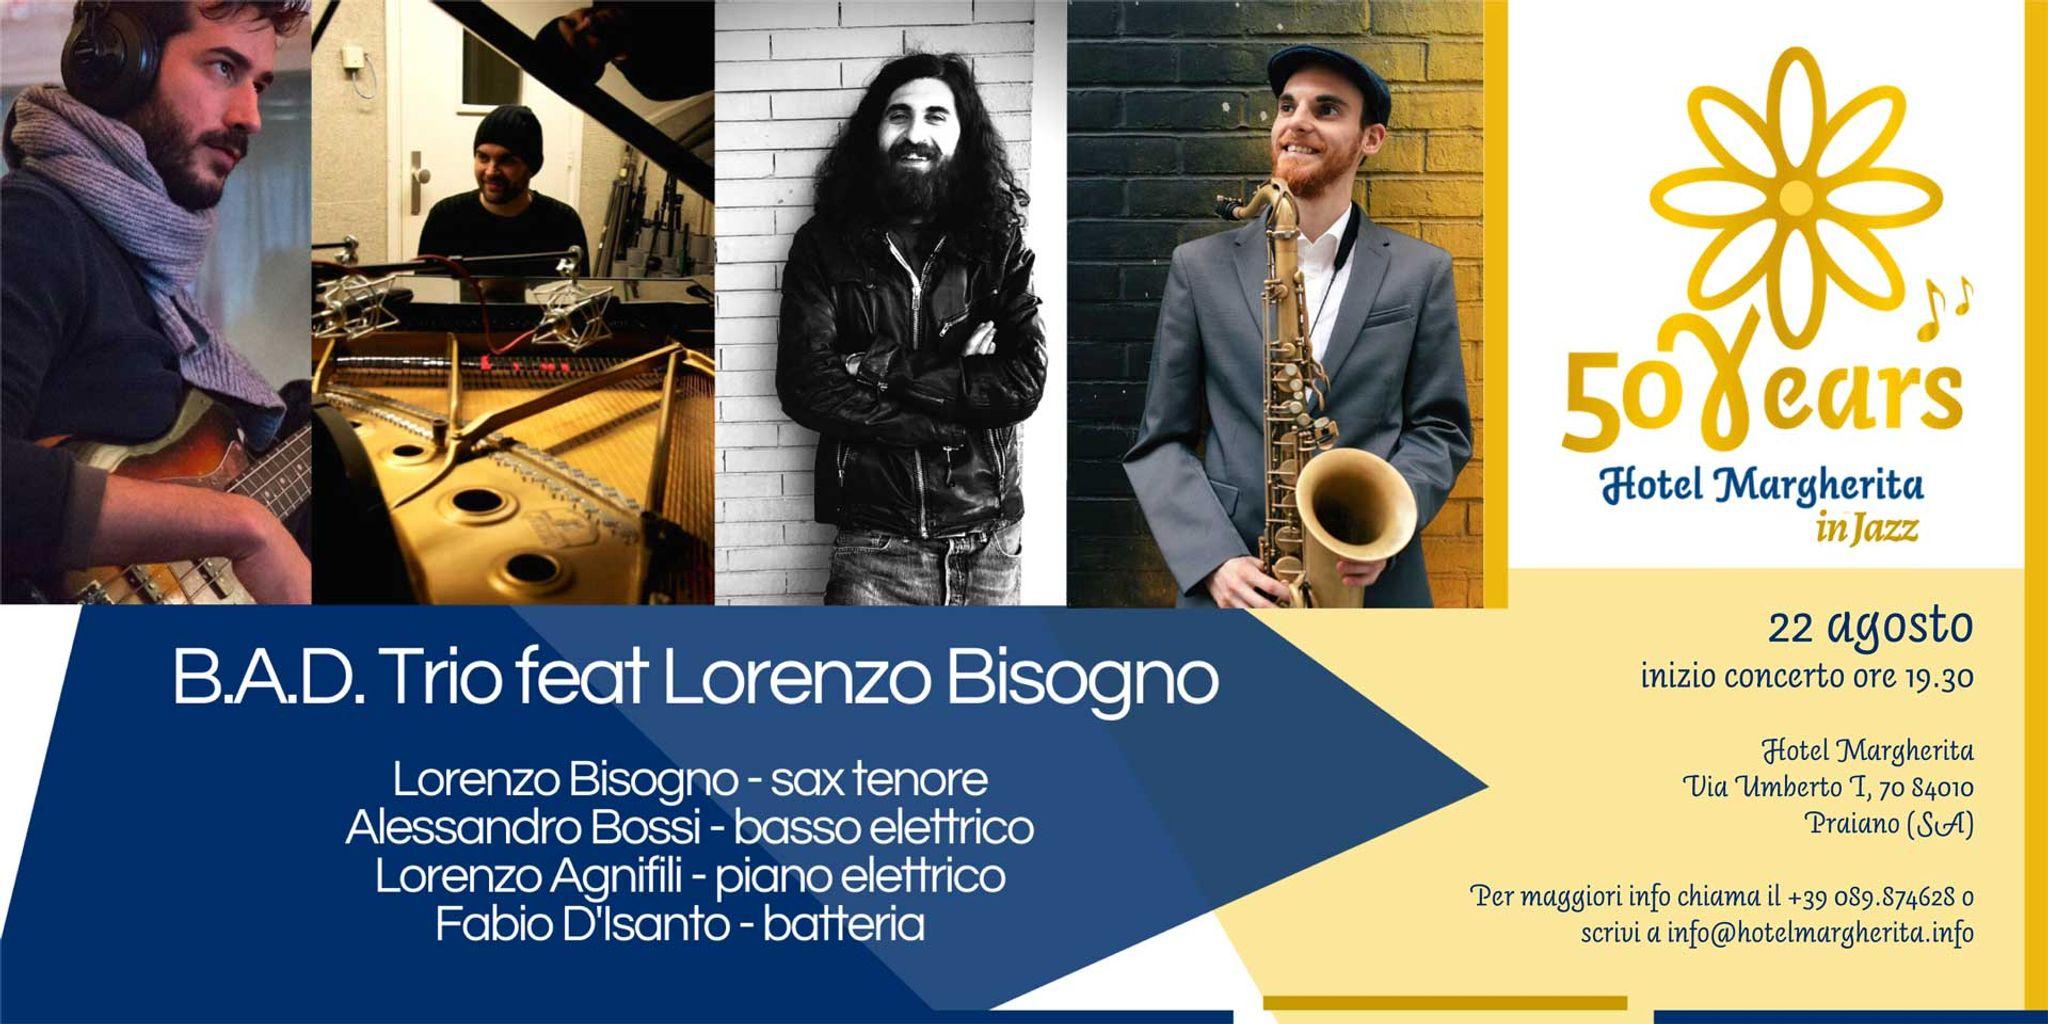 Hotel Margherita in Jazz: B.A.D. TRIO feat Lorenzo Bisogno